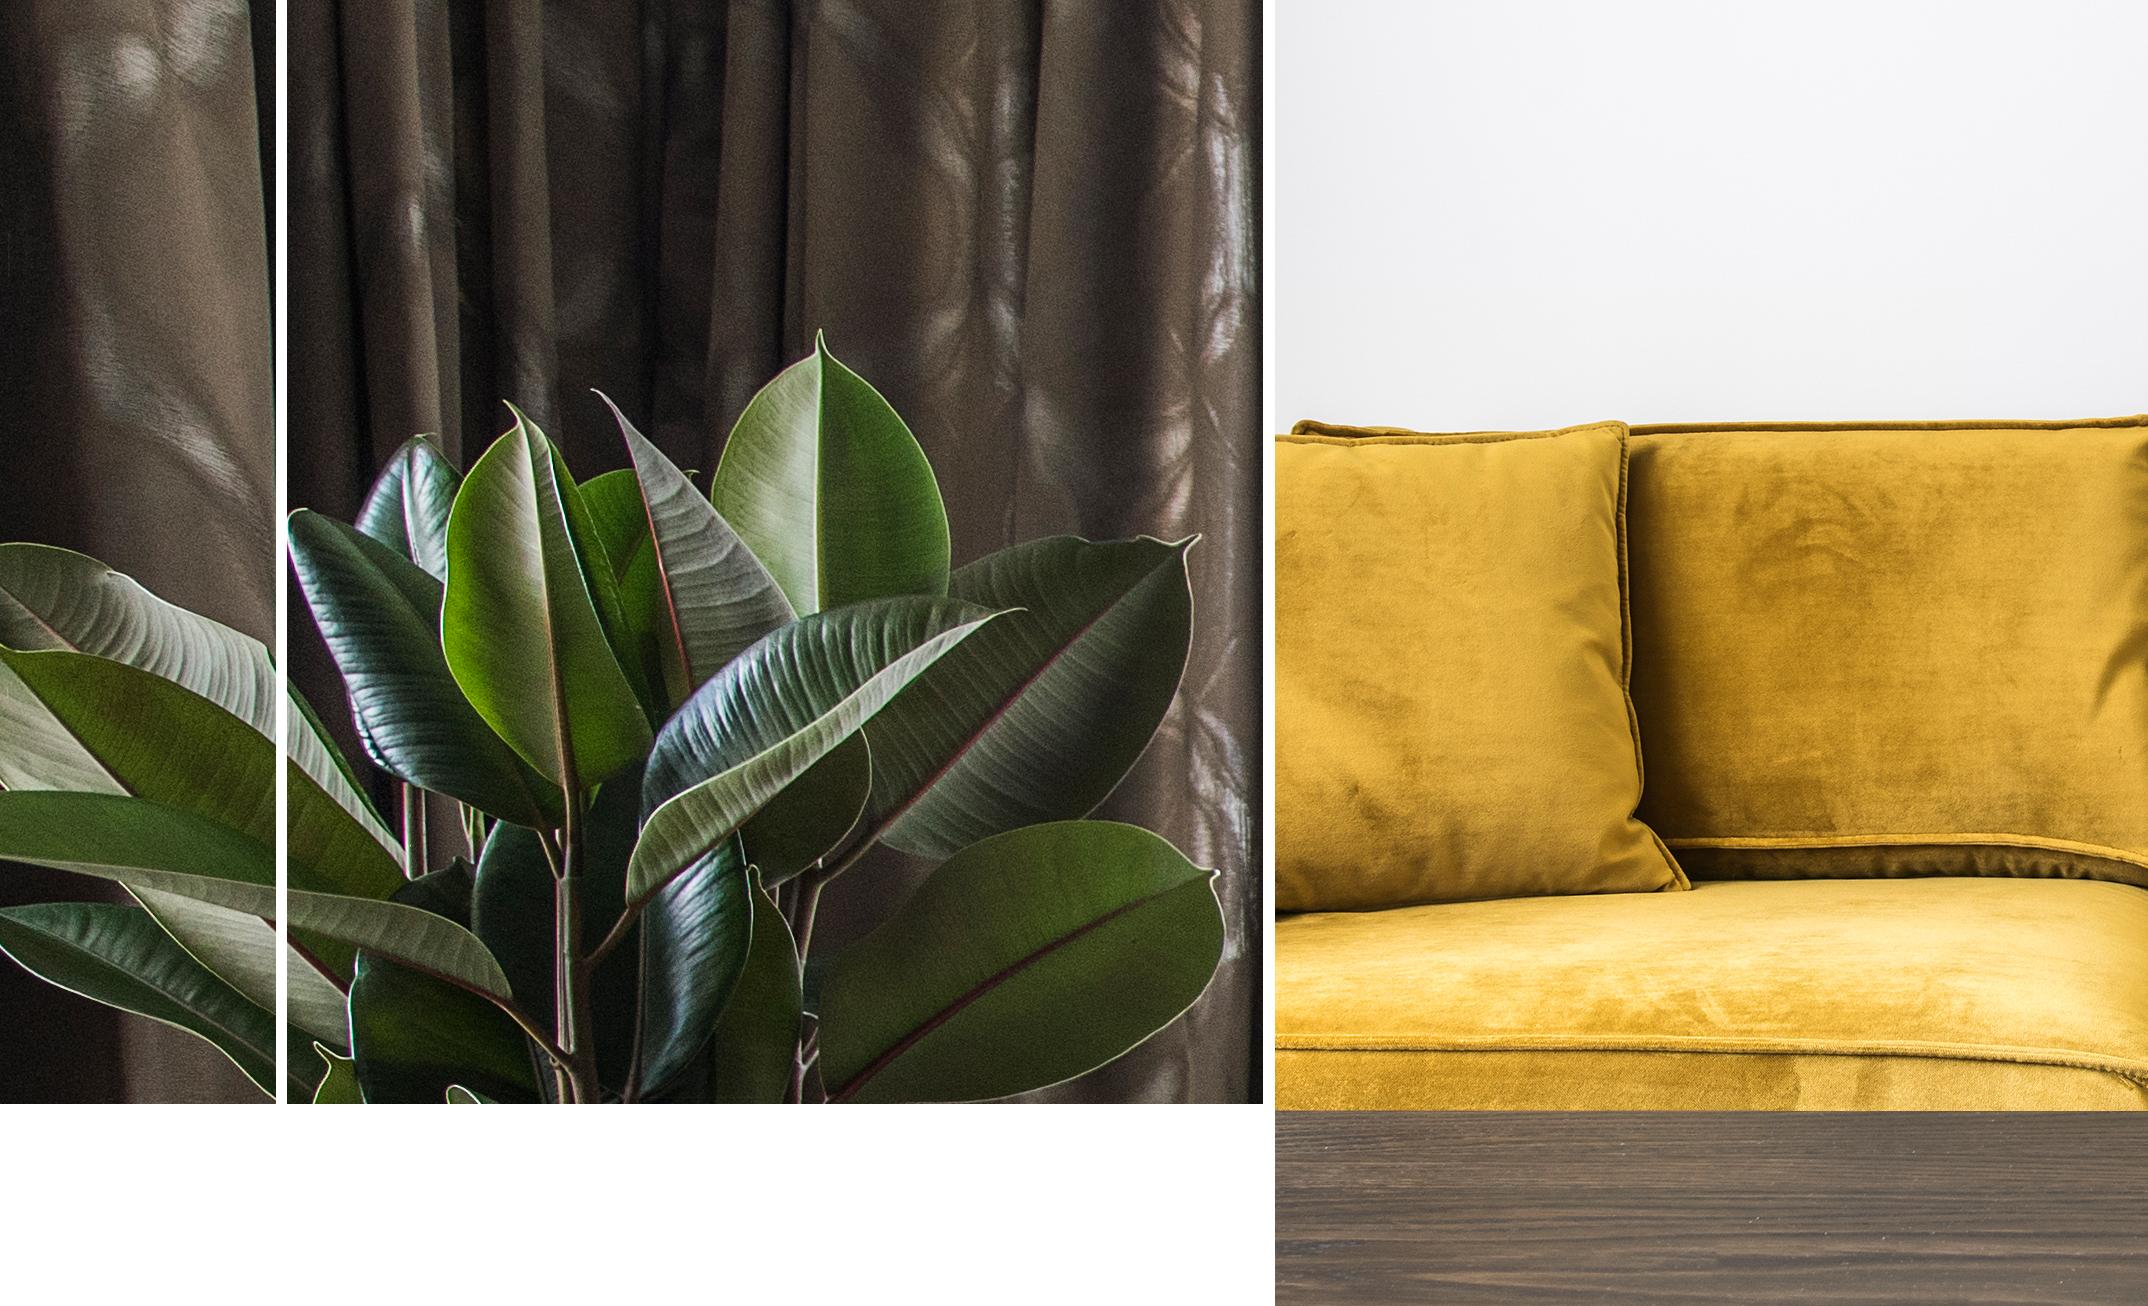 EJtekstile–-interjero-tekstiles-projektavimo-studija--Interior-textile-design-studio-5.1